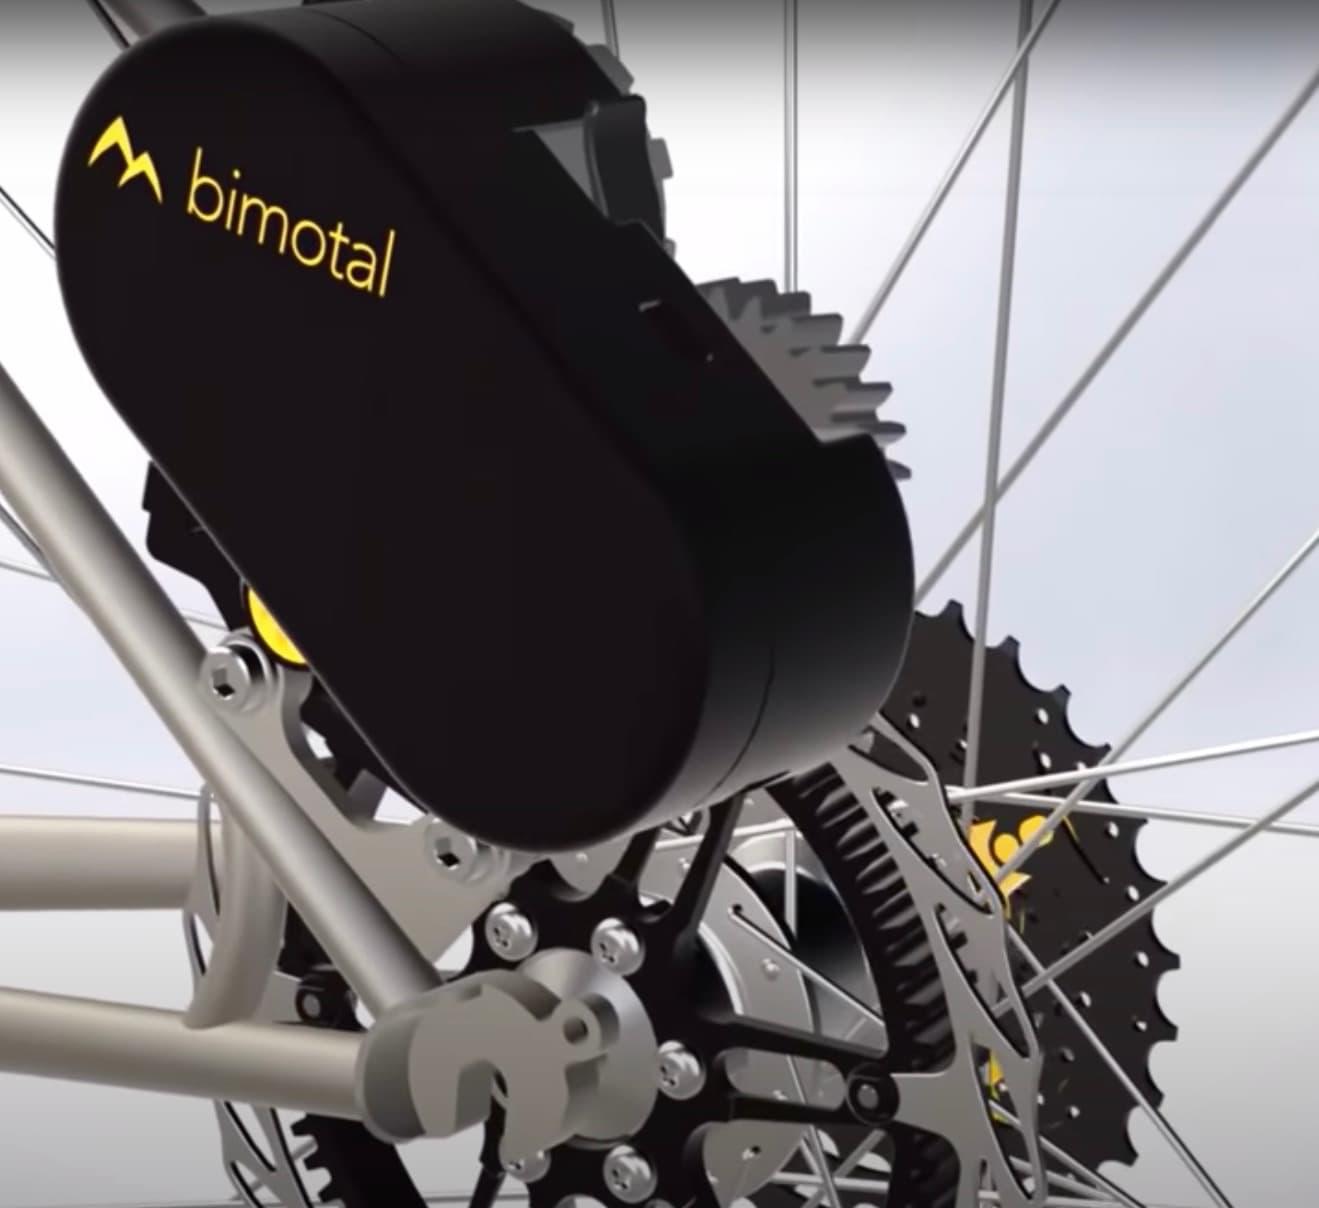 Bimotal mounted